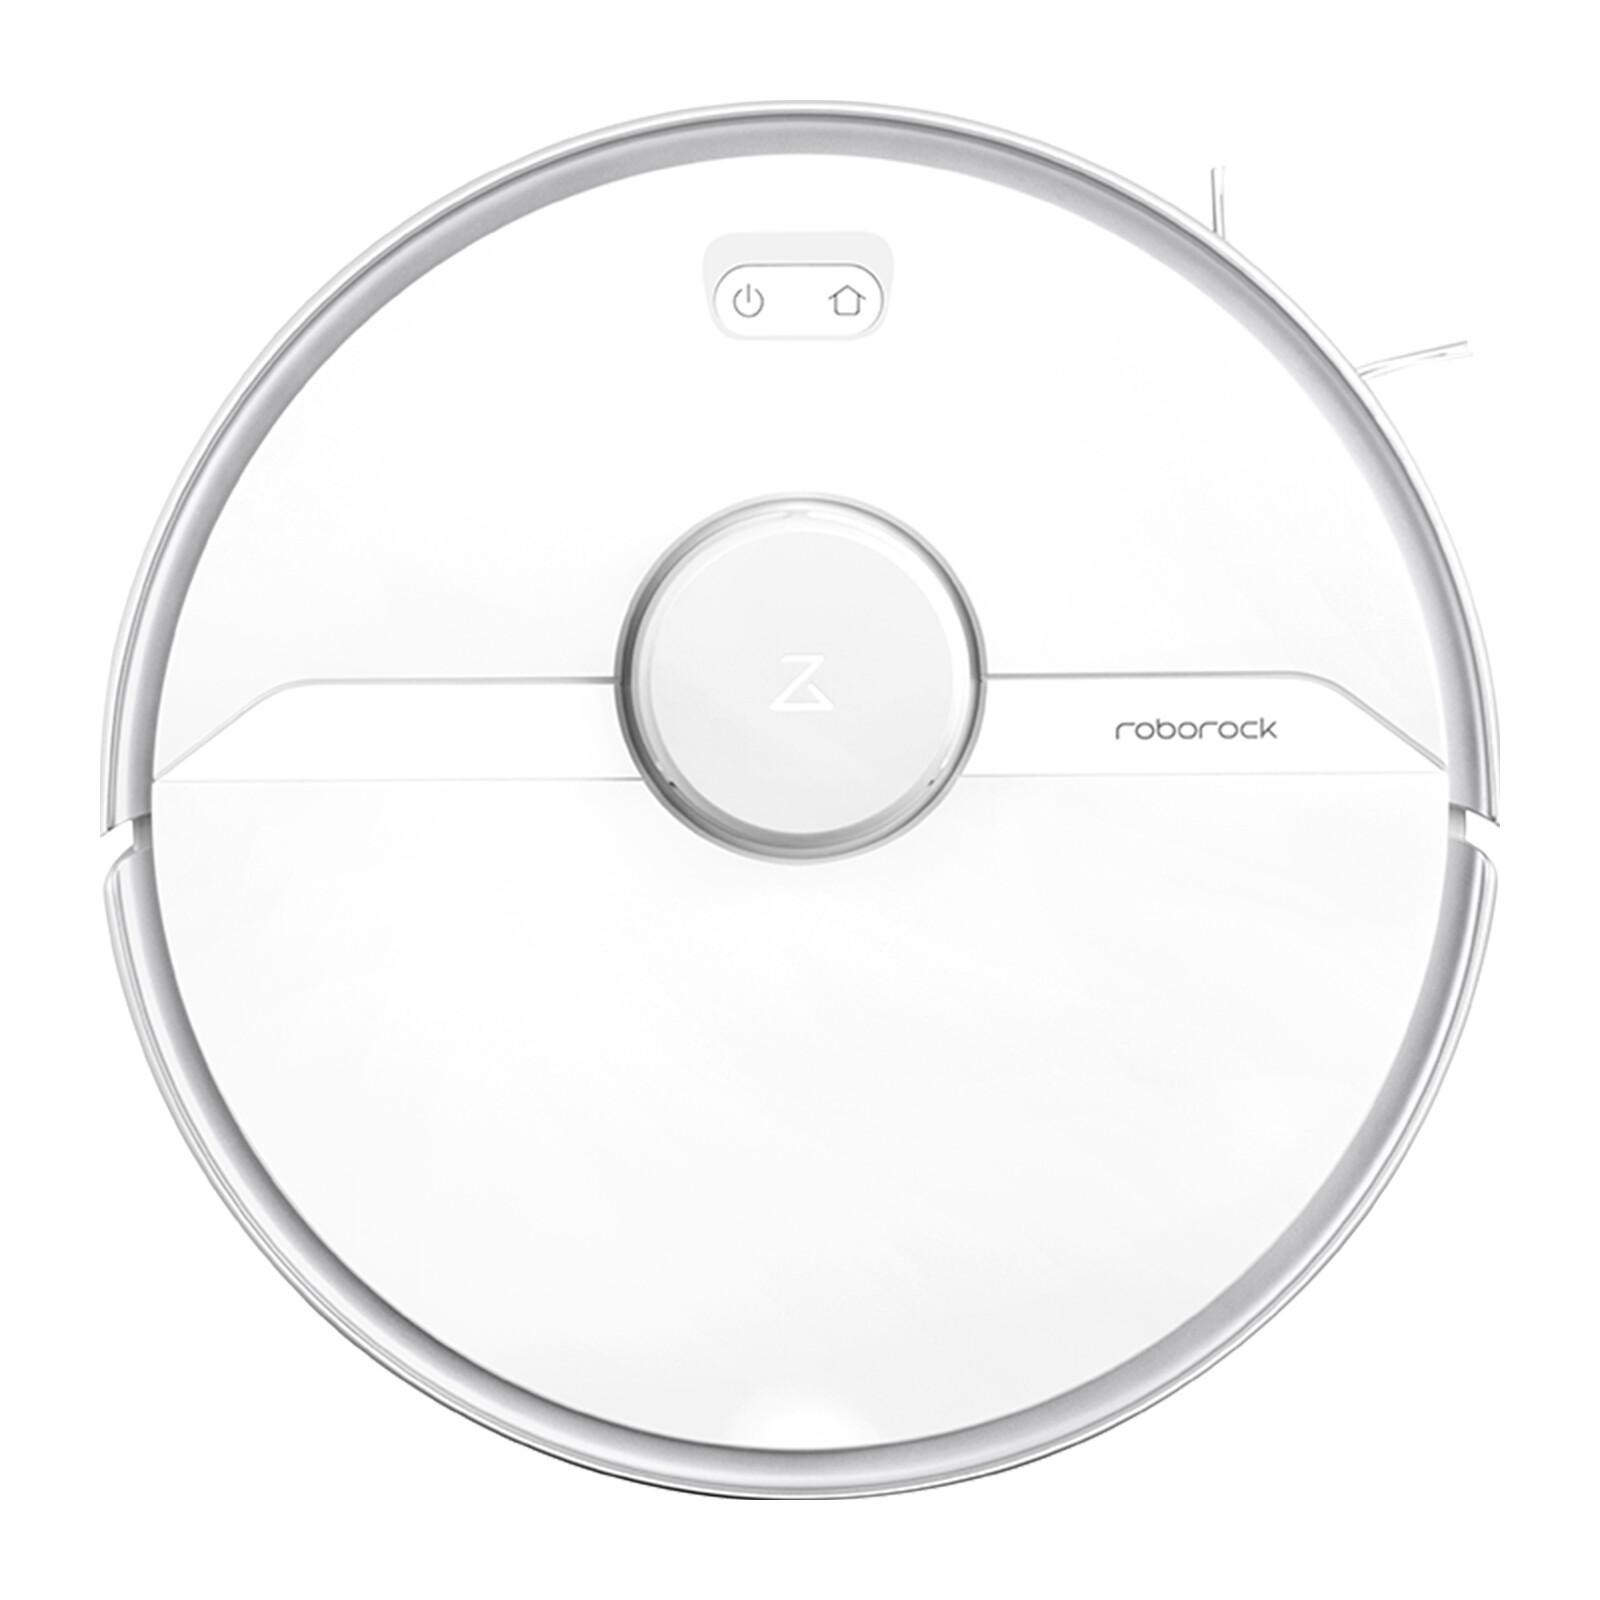 Xiaomi Roborock S6 Pure Staubsaugroboter und Wischroboter